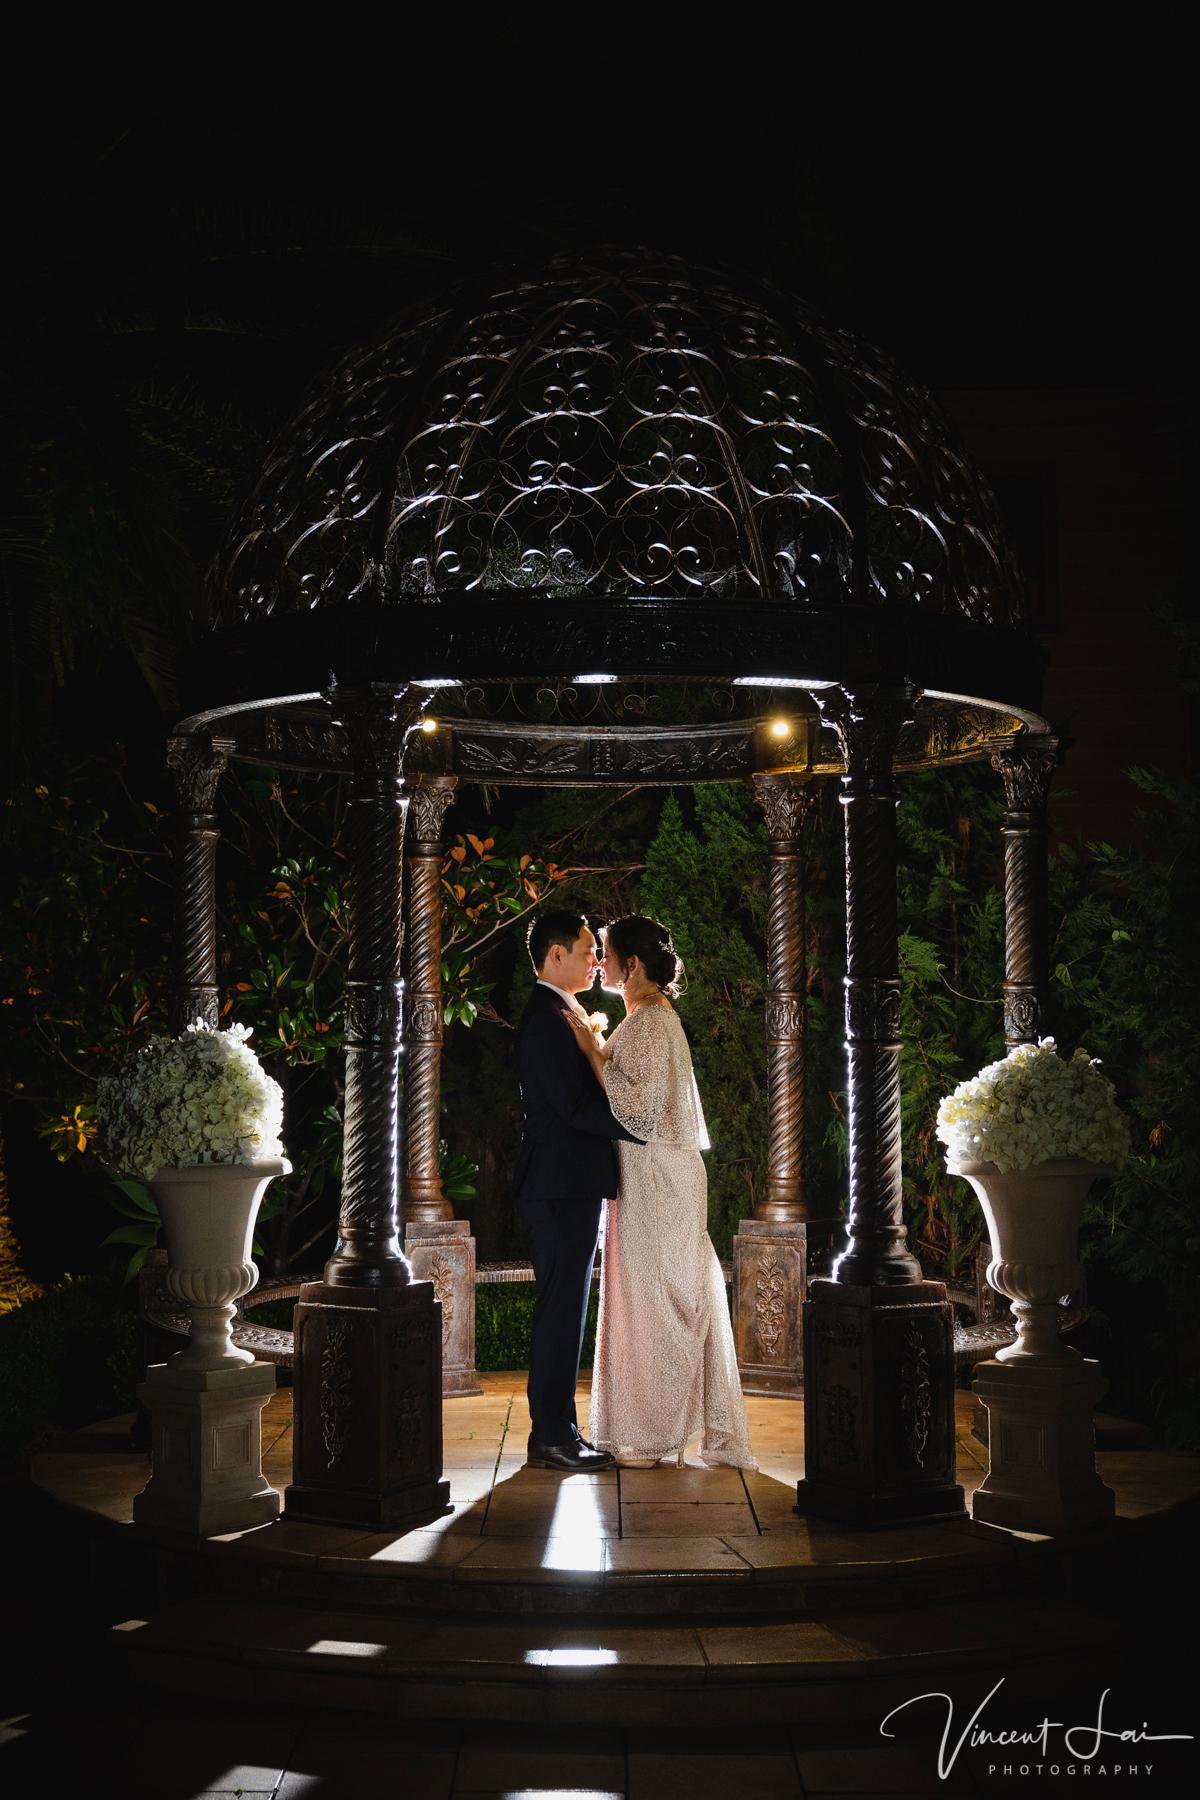 Wedding at Lauriston House Reception